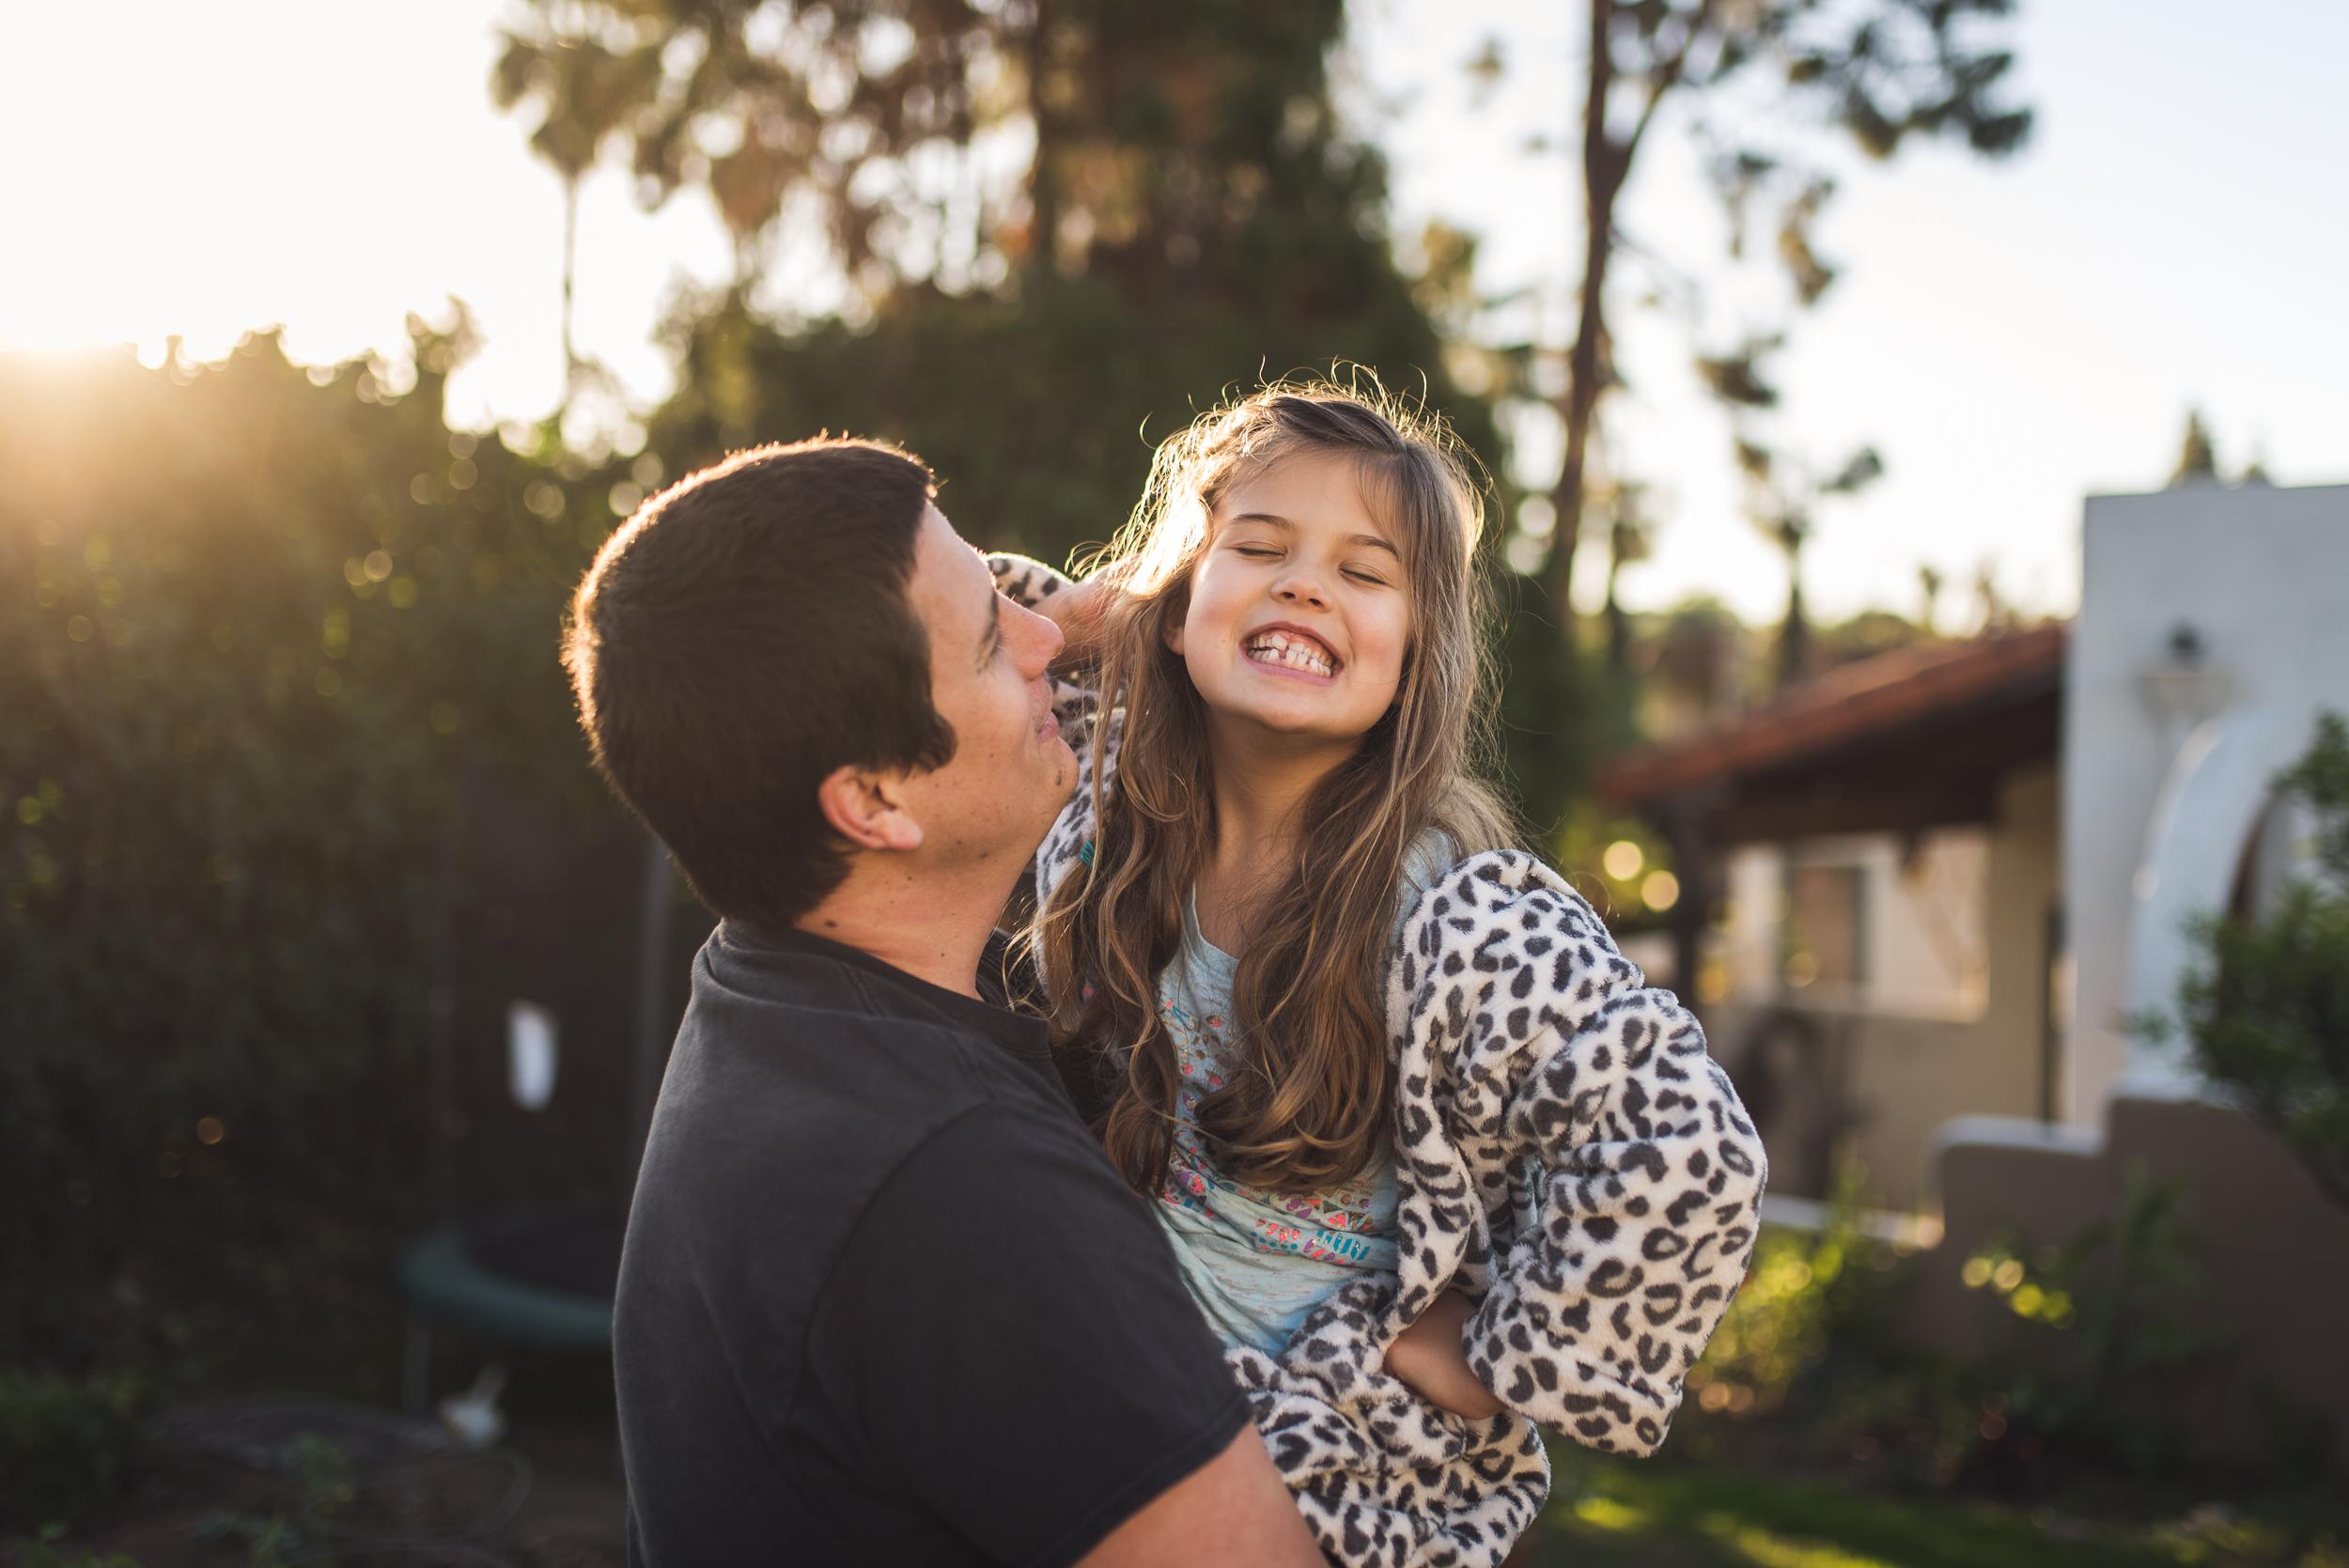 2018-San-Diego-Family-Lifestyle-Newborn-Travel-Vacation-Photographer-Kelsey-Smith-Photography-Coronado-La-Jolla-Encinitas-Solana-Beach-Del-Mar-272.jpg